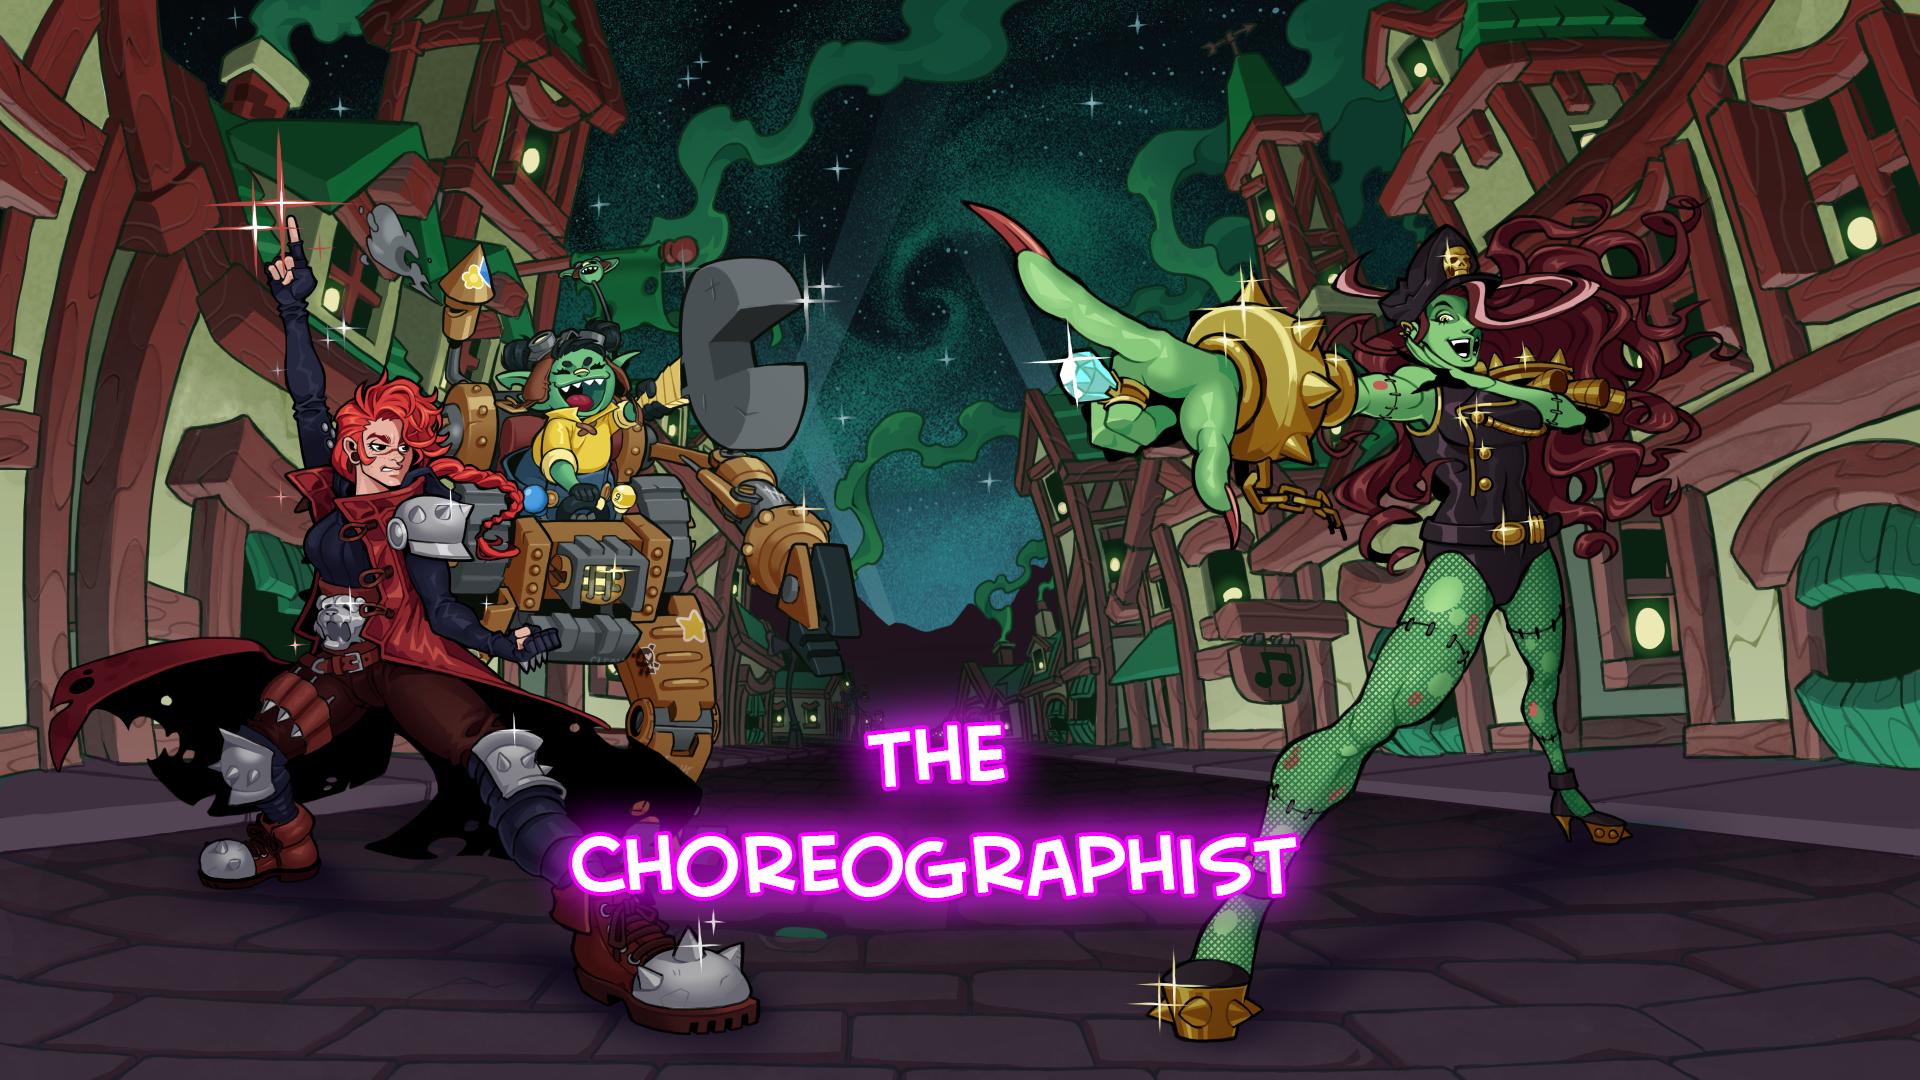 The Choreographist